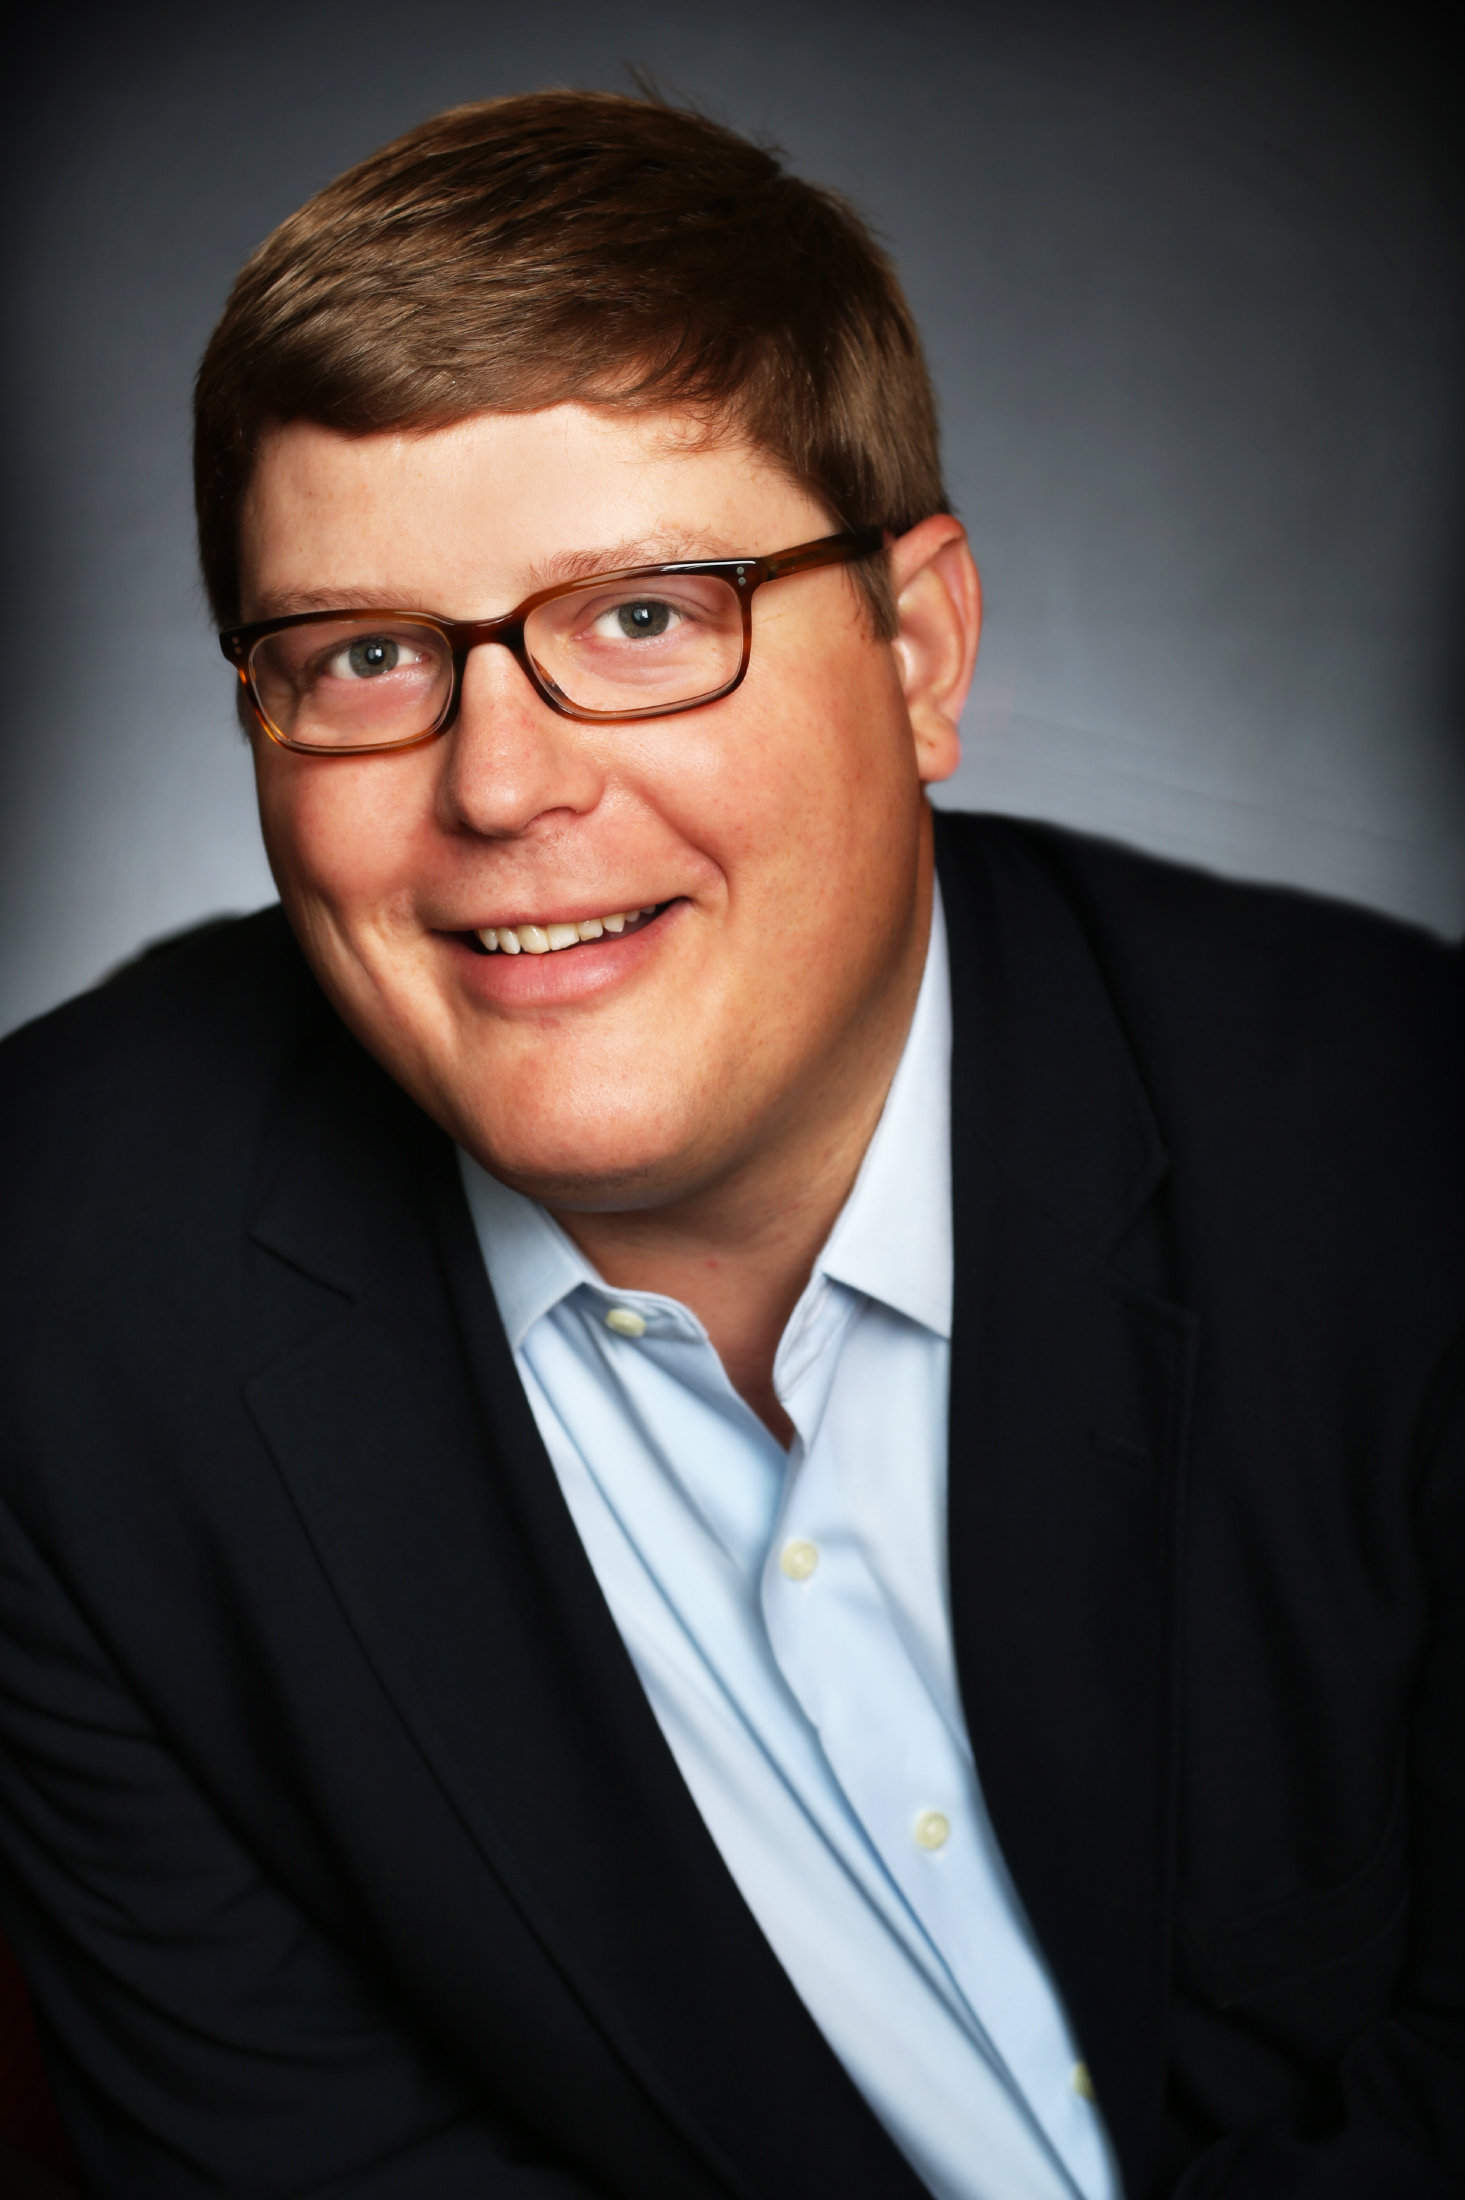 Ben Edwards Transaction Advisor